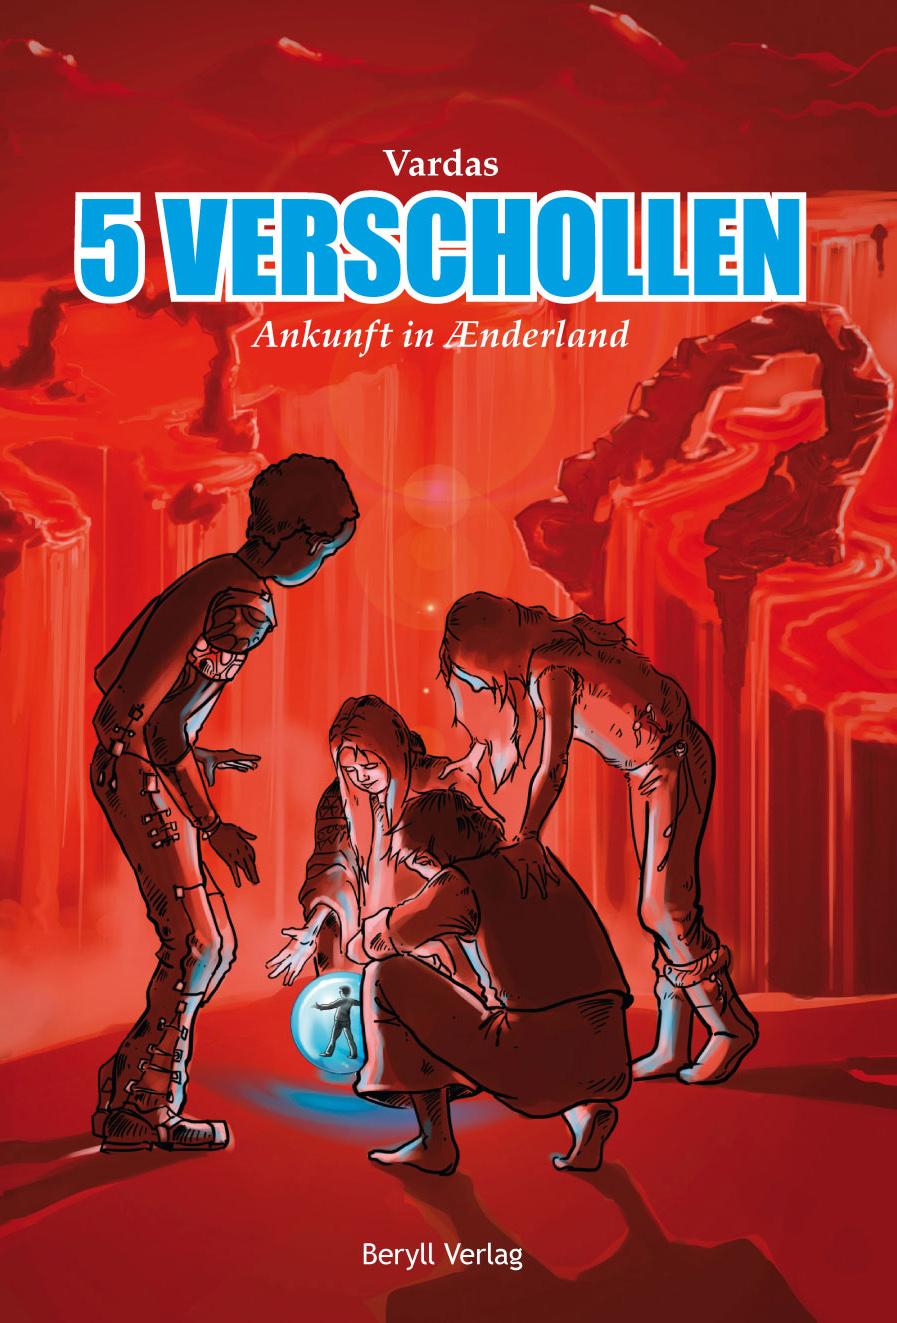 5 VERSCHOLLEN: Ankunft in Ænderland - Martius-Weber, Nathalie